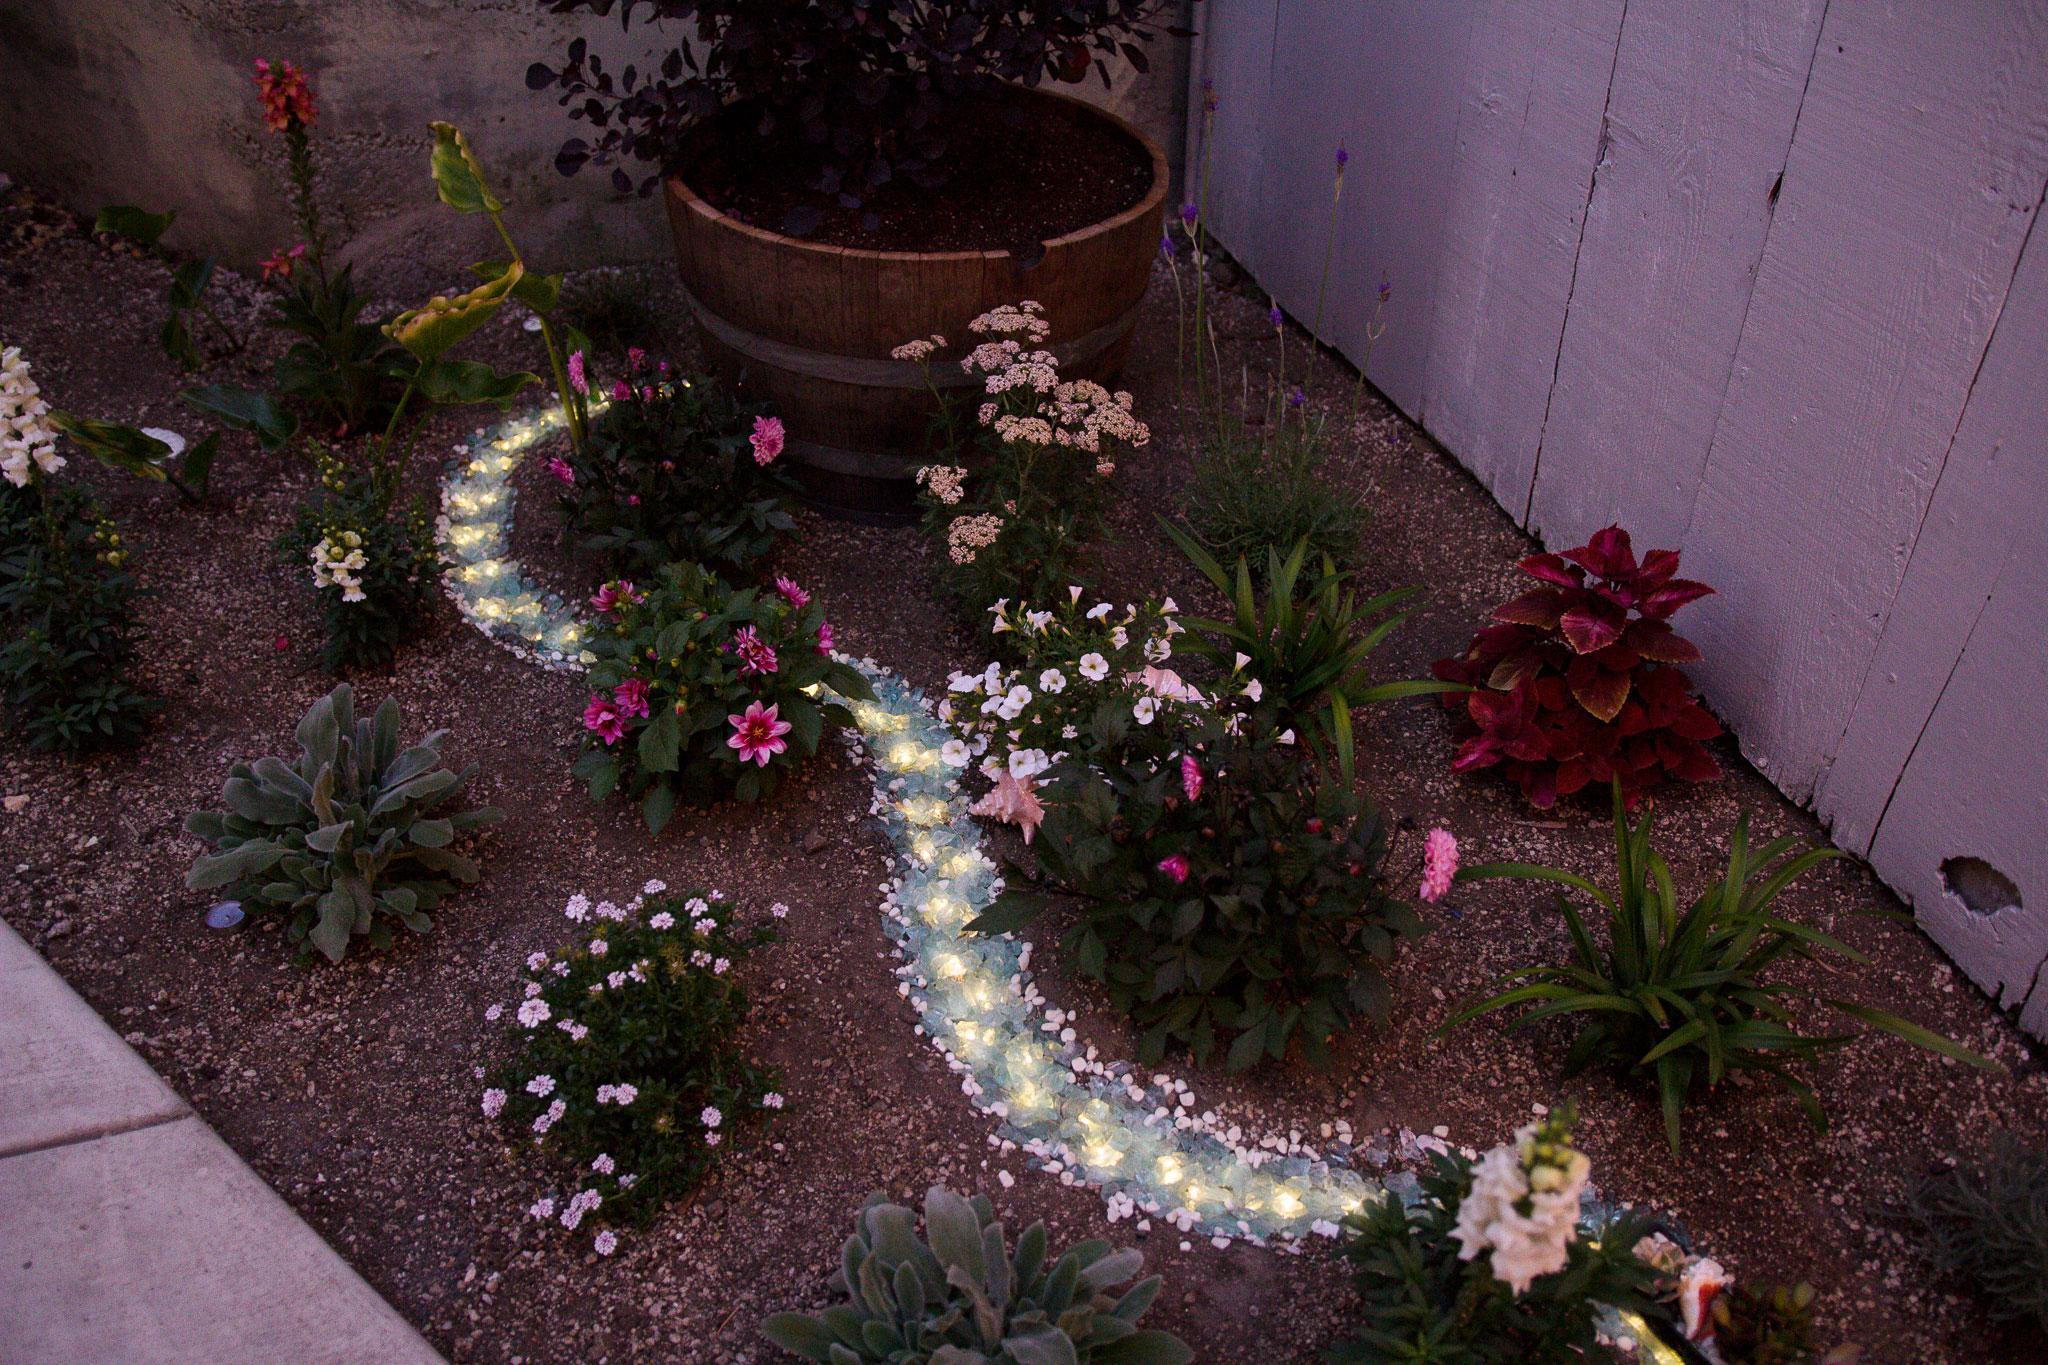 Adelya_Tumasyeva_the-garden-project_32.jpg